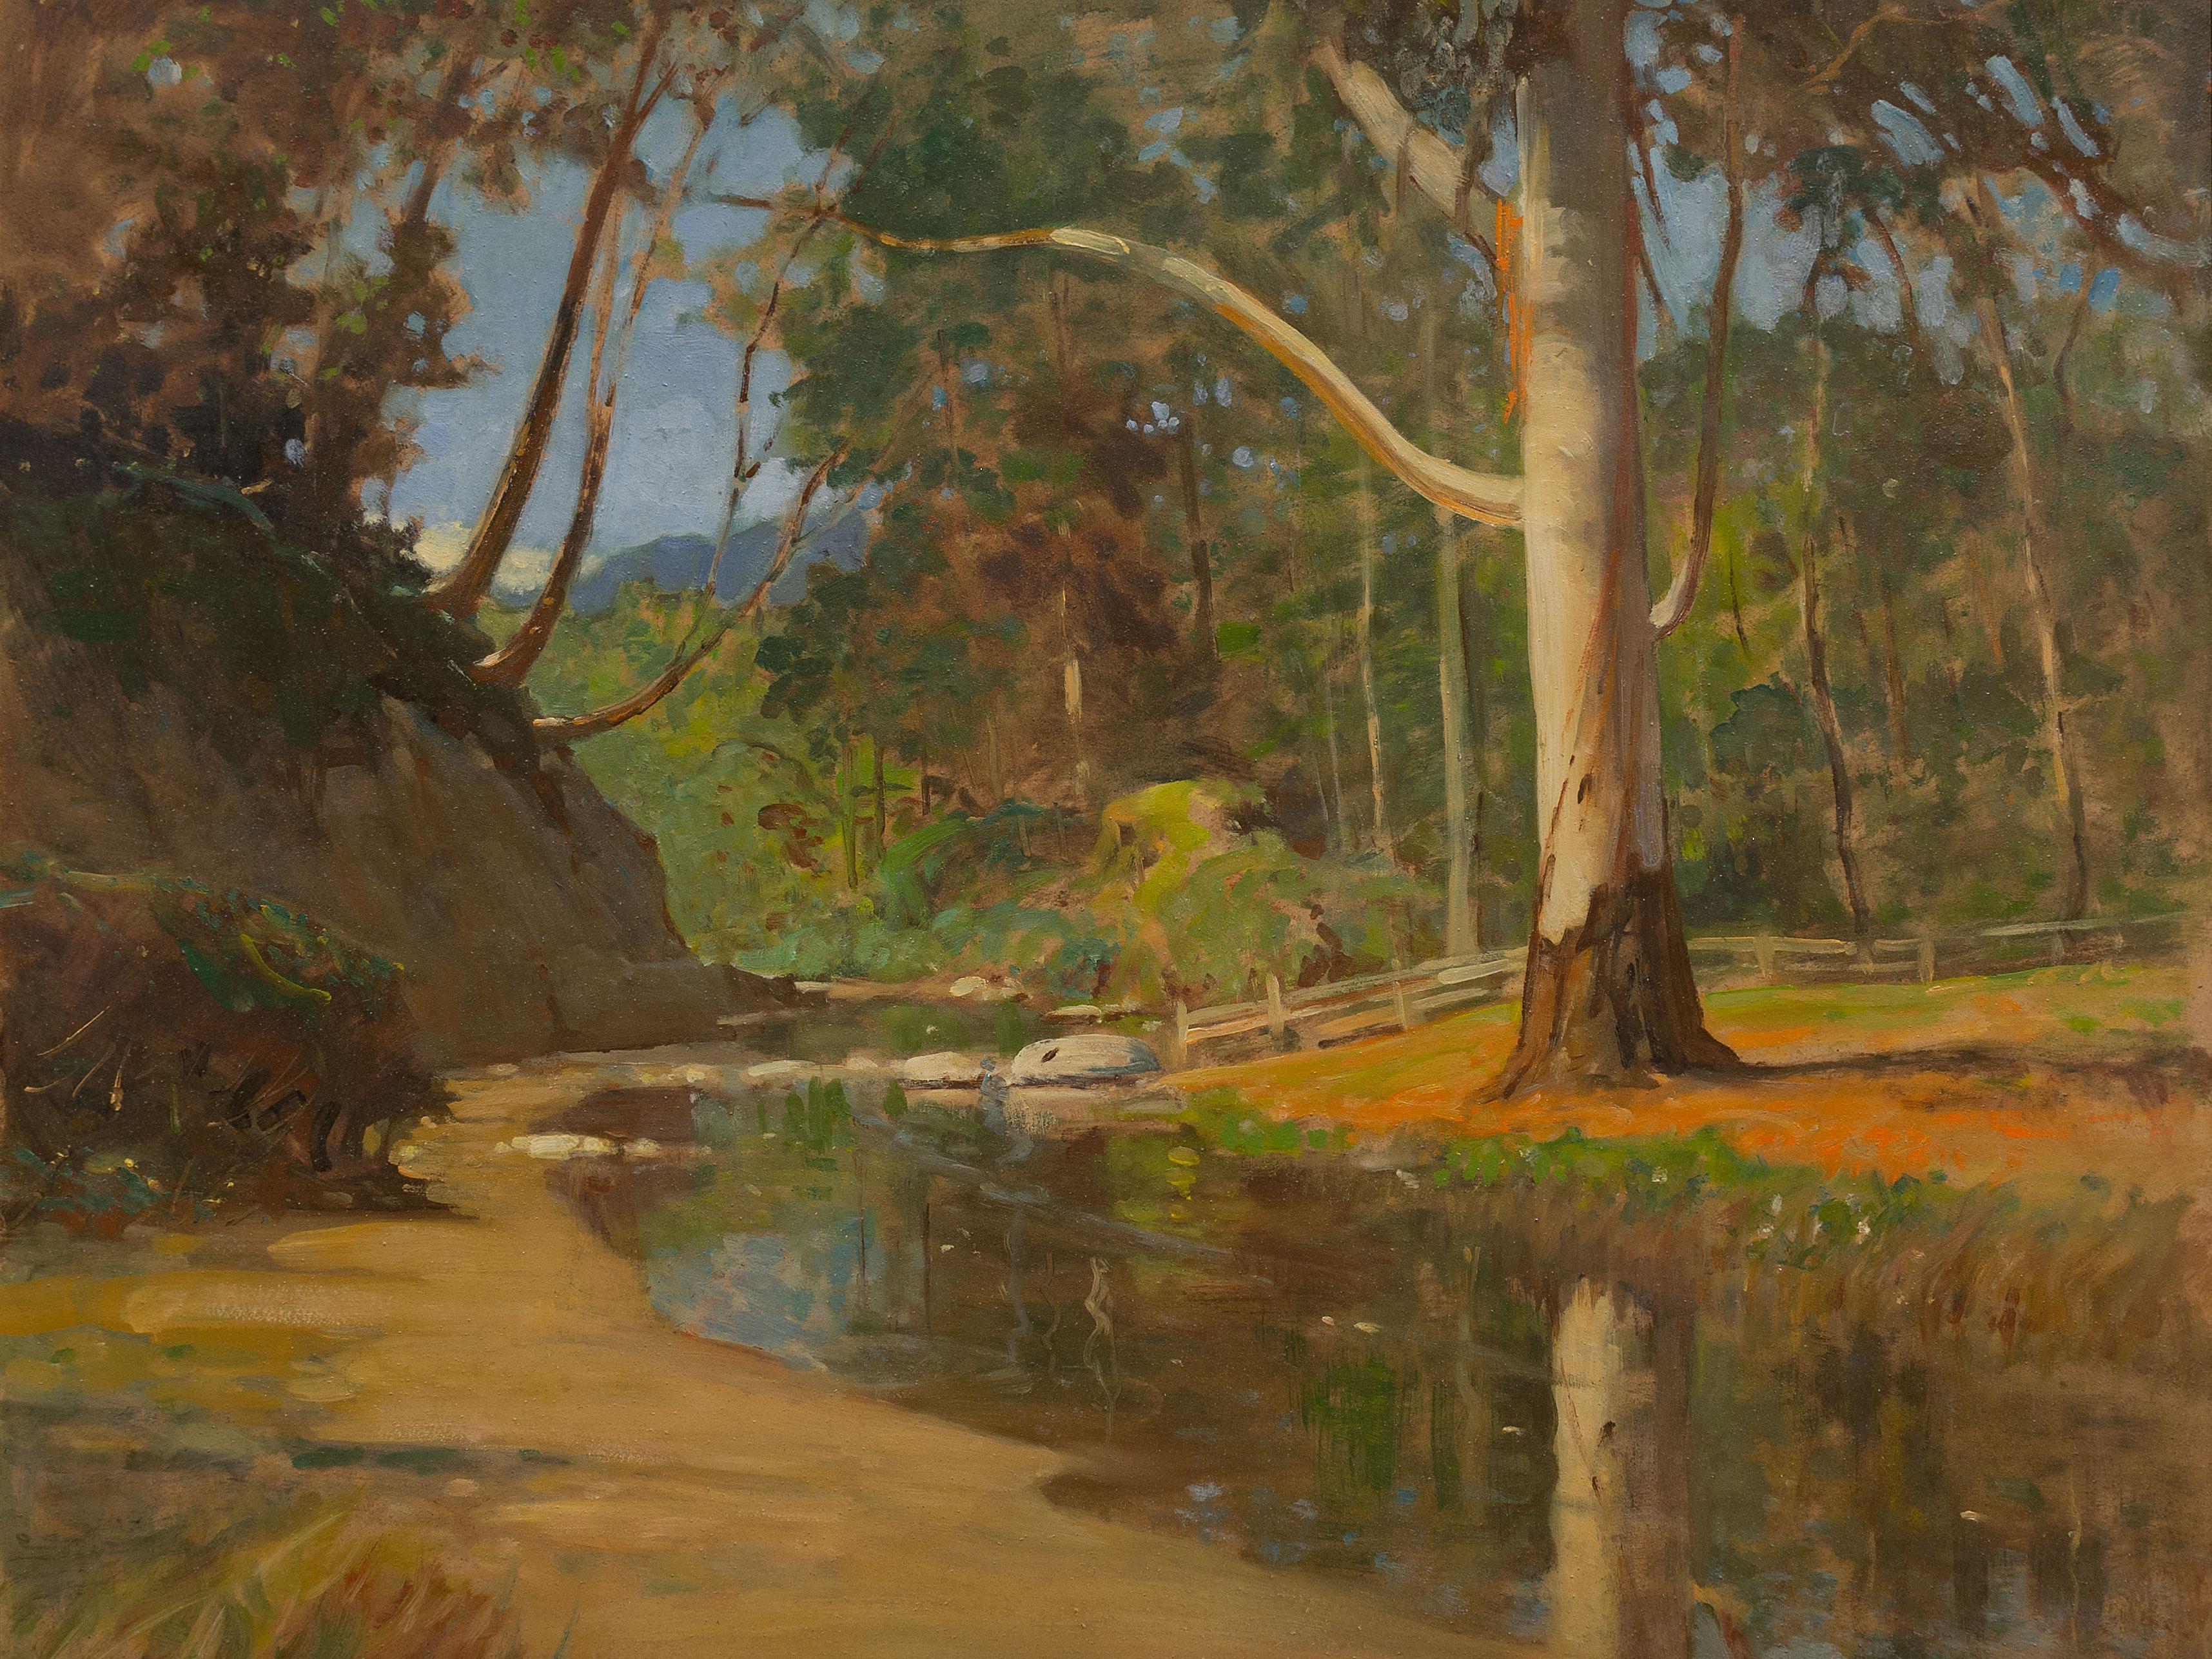 W.G. Wiles (SA 1875 - 1966) Oil, River Landscape, Signed, 60 x 75